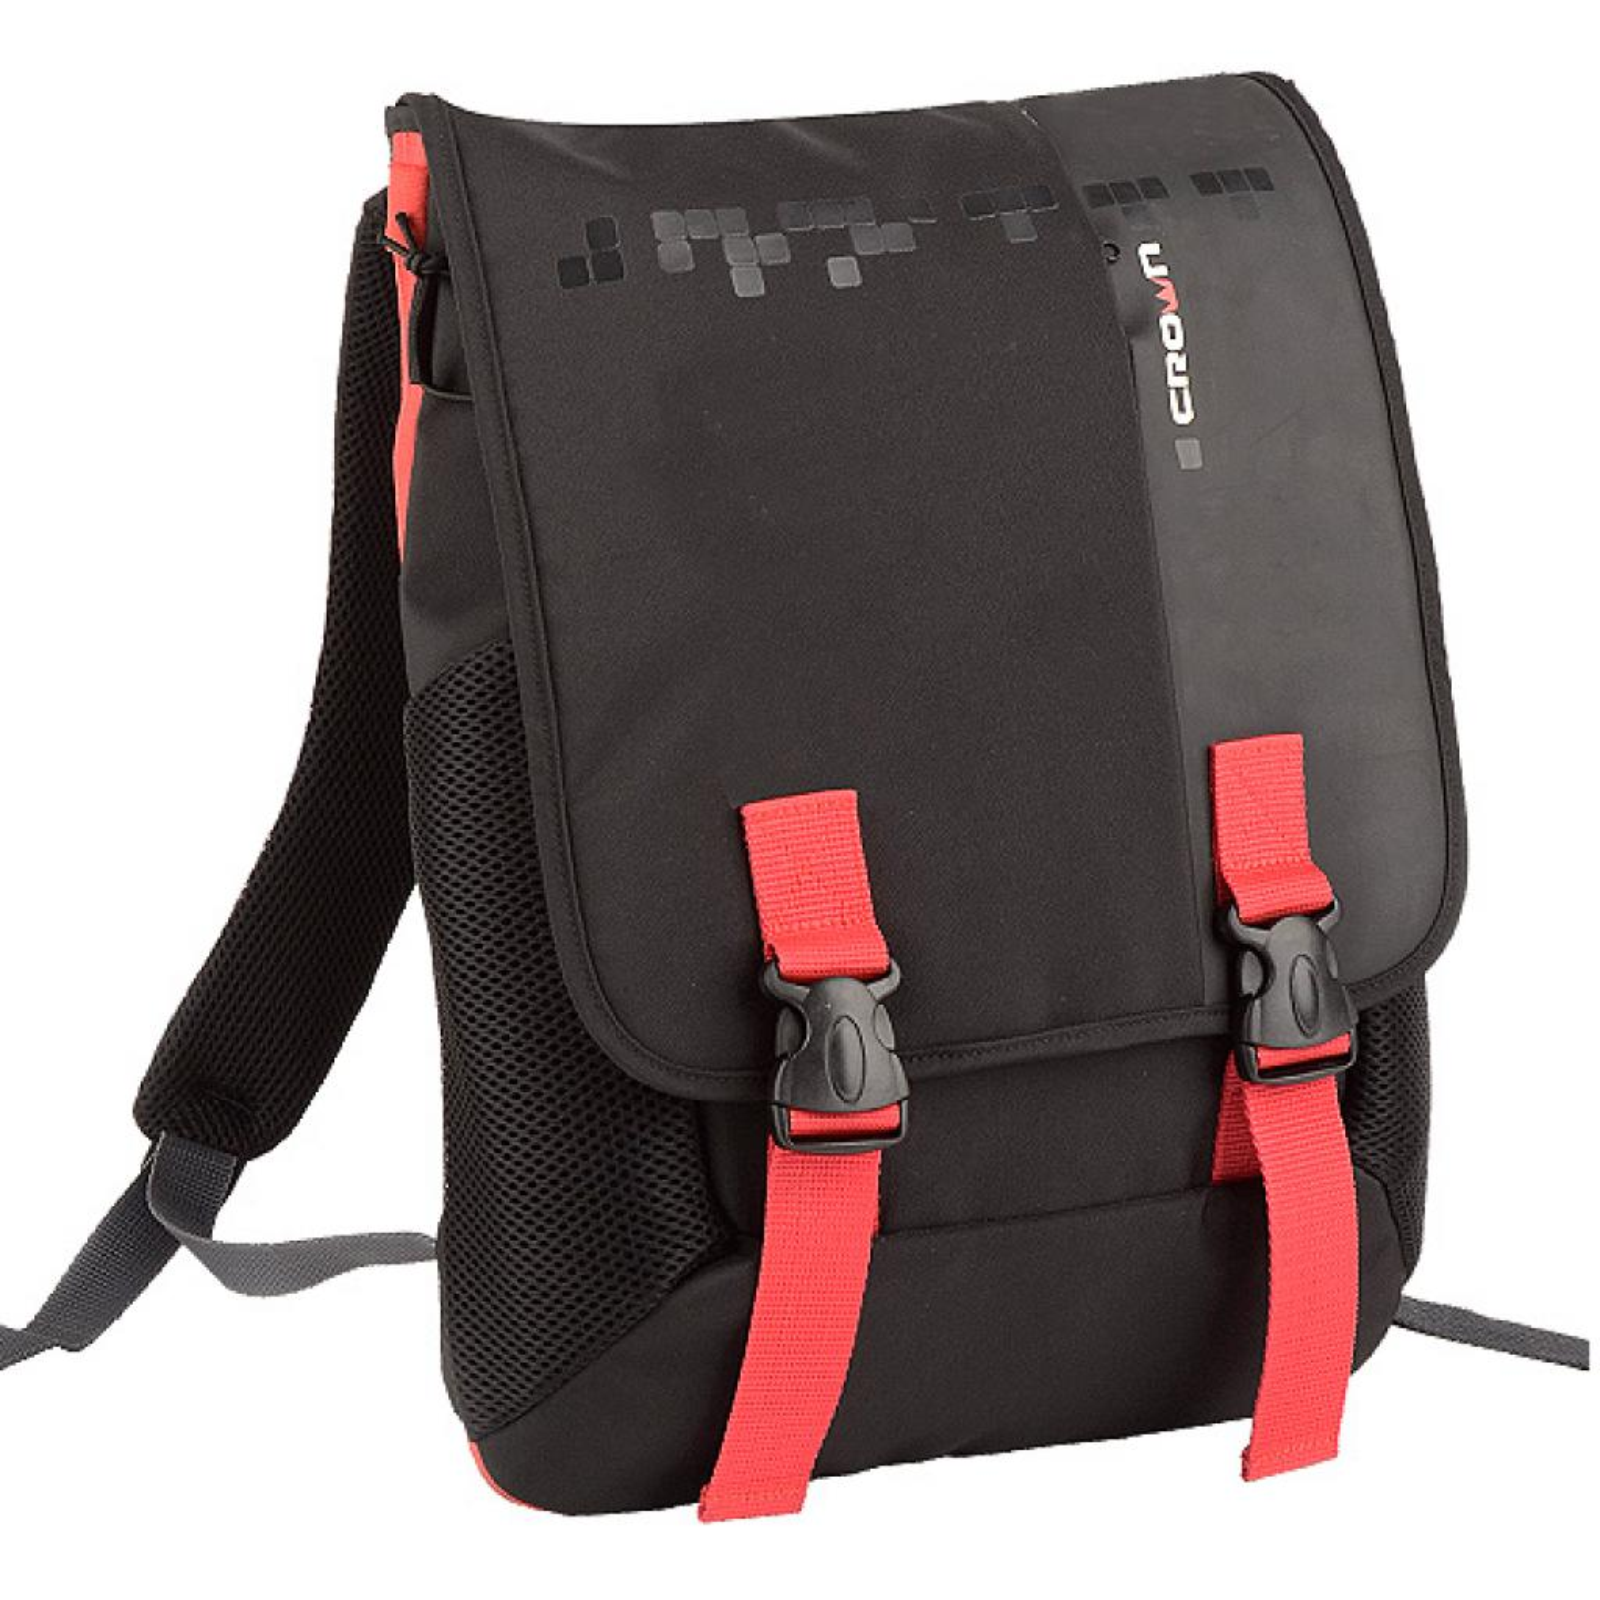 Рюкзак для ноутбука Crown 15.6 Harmony black and red (BPH3315BR) изображение 2